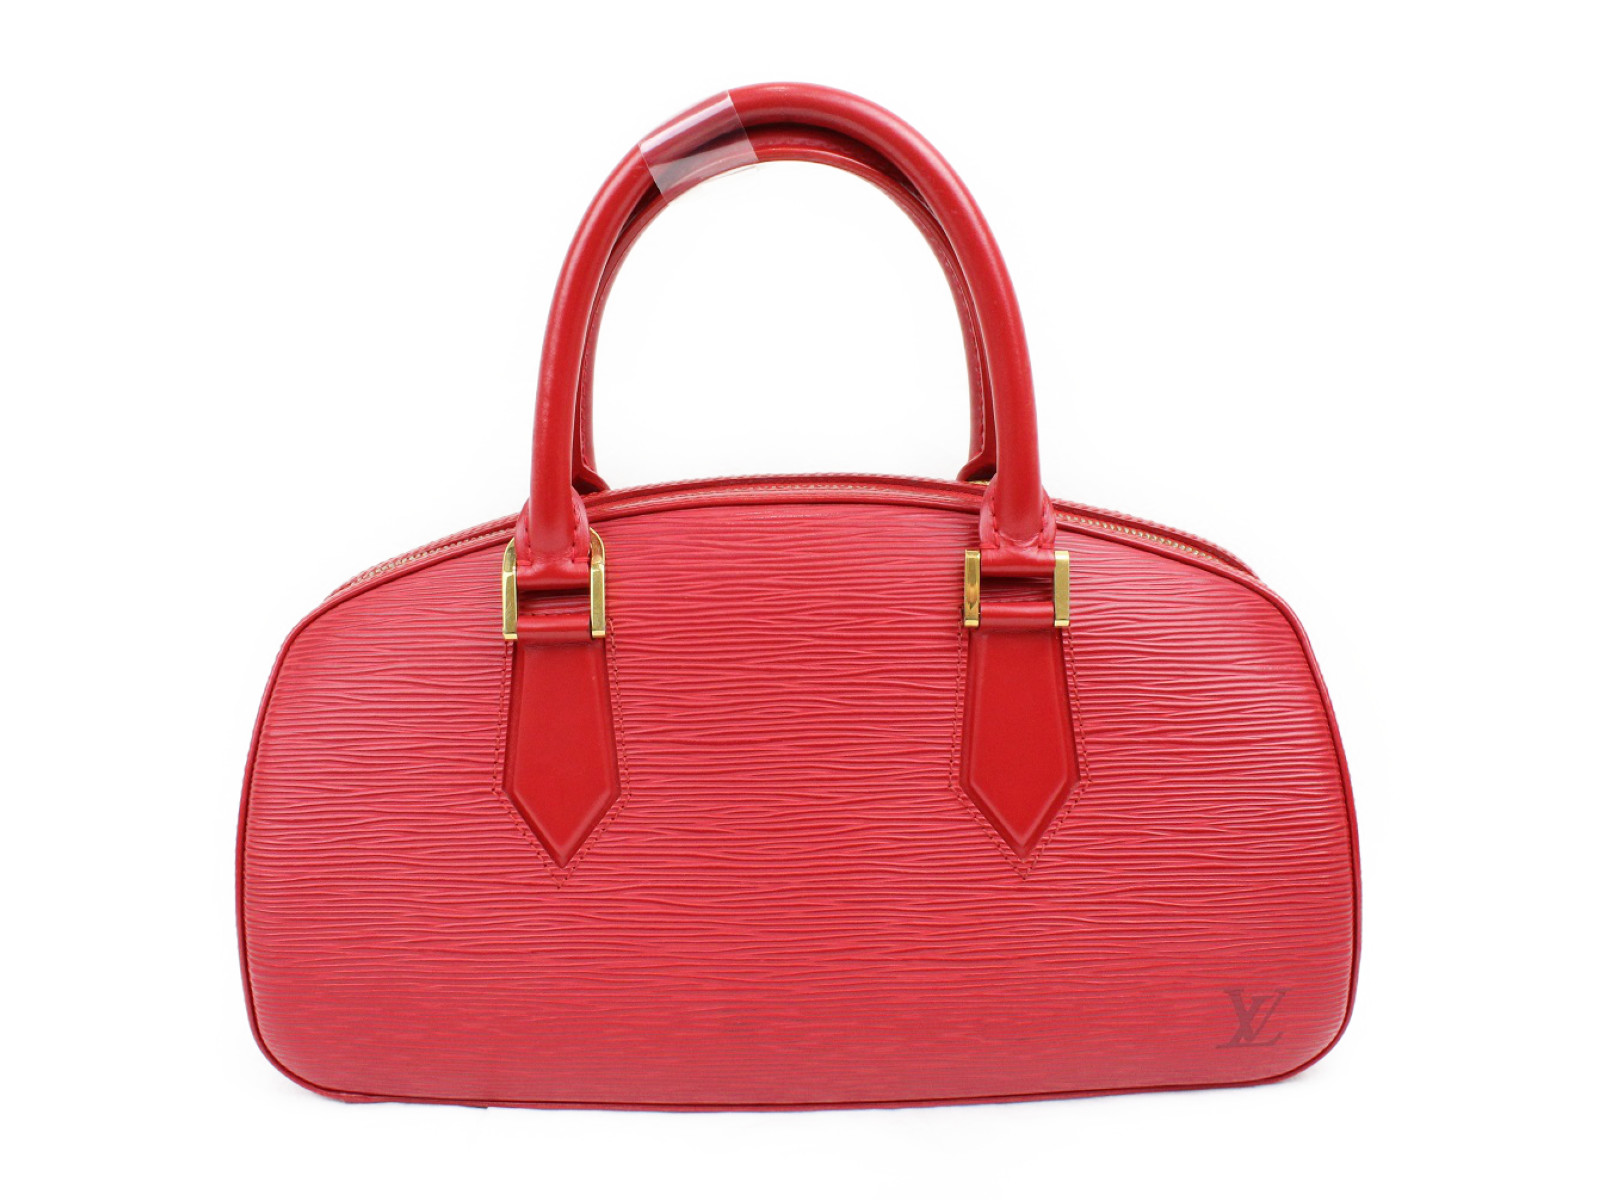 LOUIS VUITTON ルイヴィトンジャスミン M5208Eエピ 赤 ハンドバッグコンパクト シンプルフォーマル プレゼント包装可【中古】